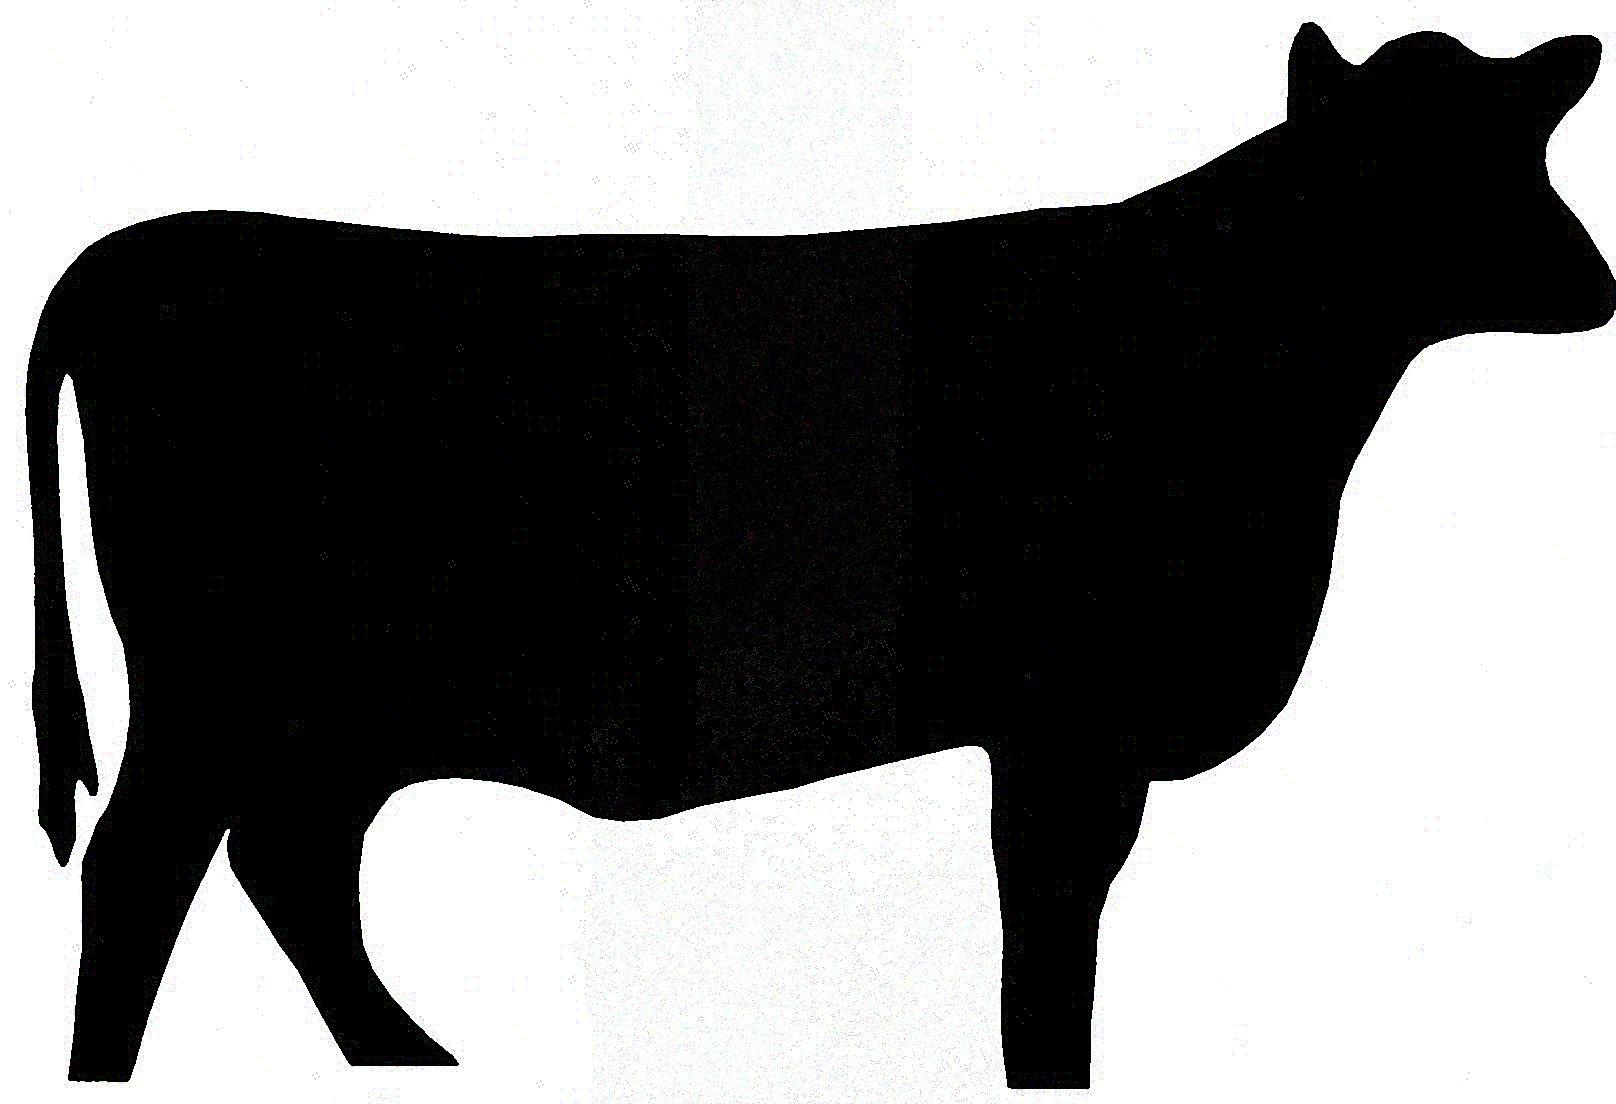 Cow Head Silhouette Clip Art Clipart Pan-Cow Head Silhouette Clip Art Clipart Panda Free Clipart Images-6